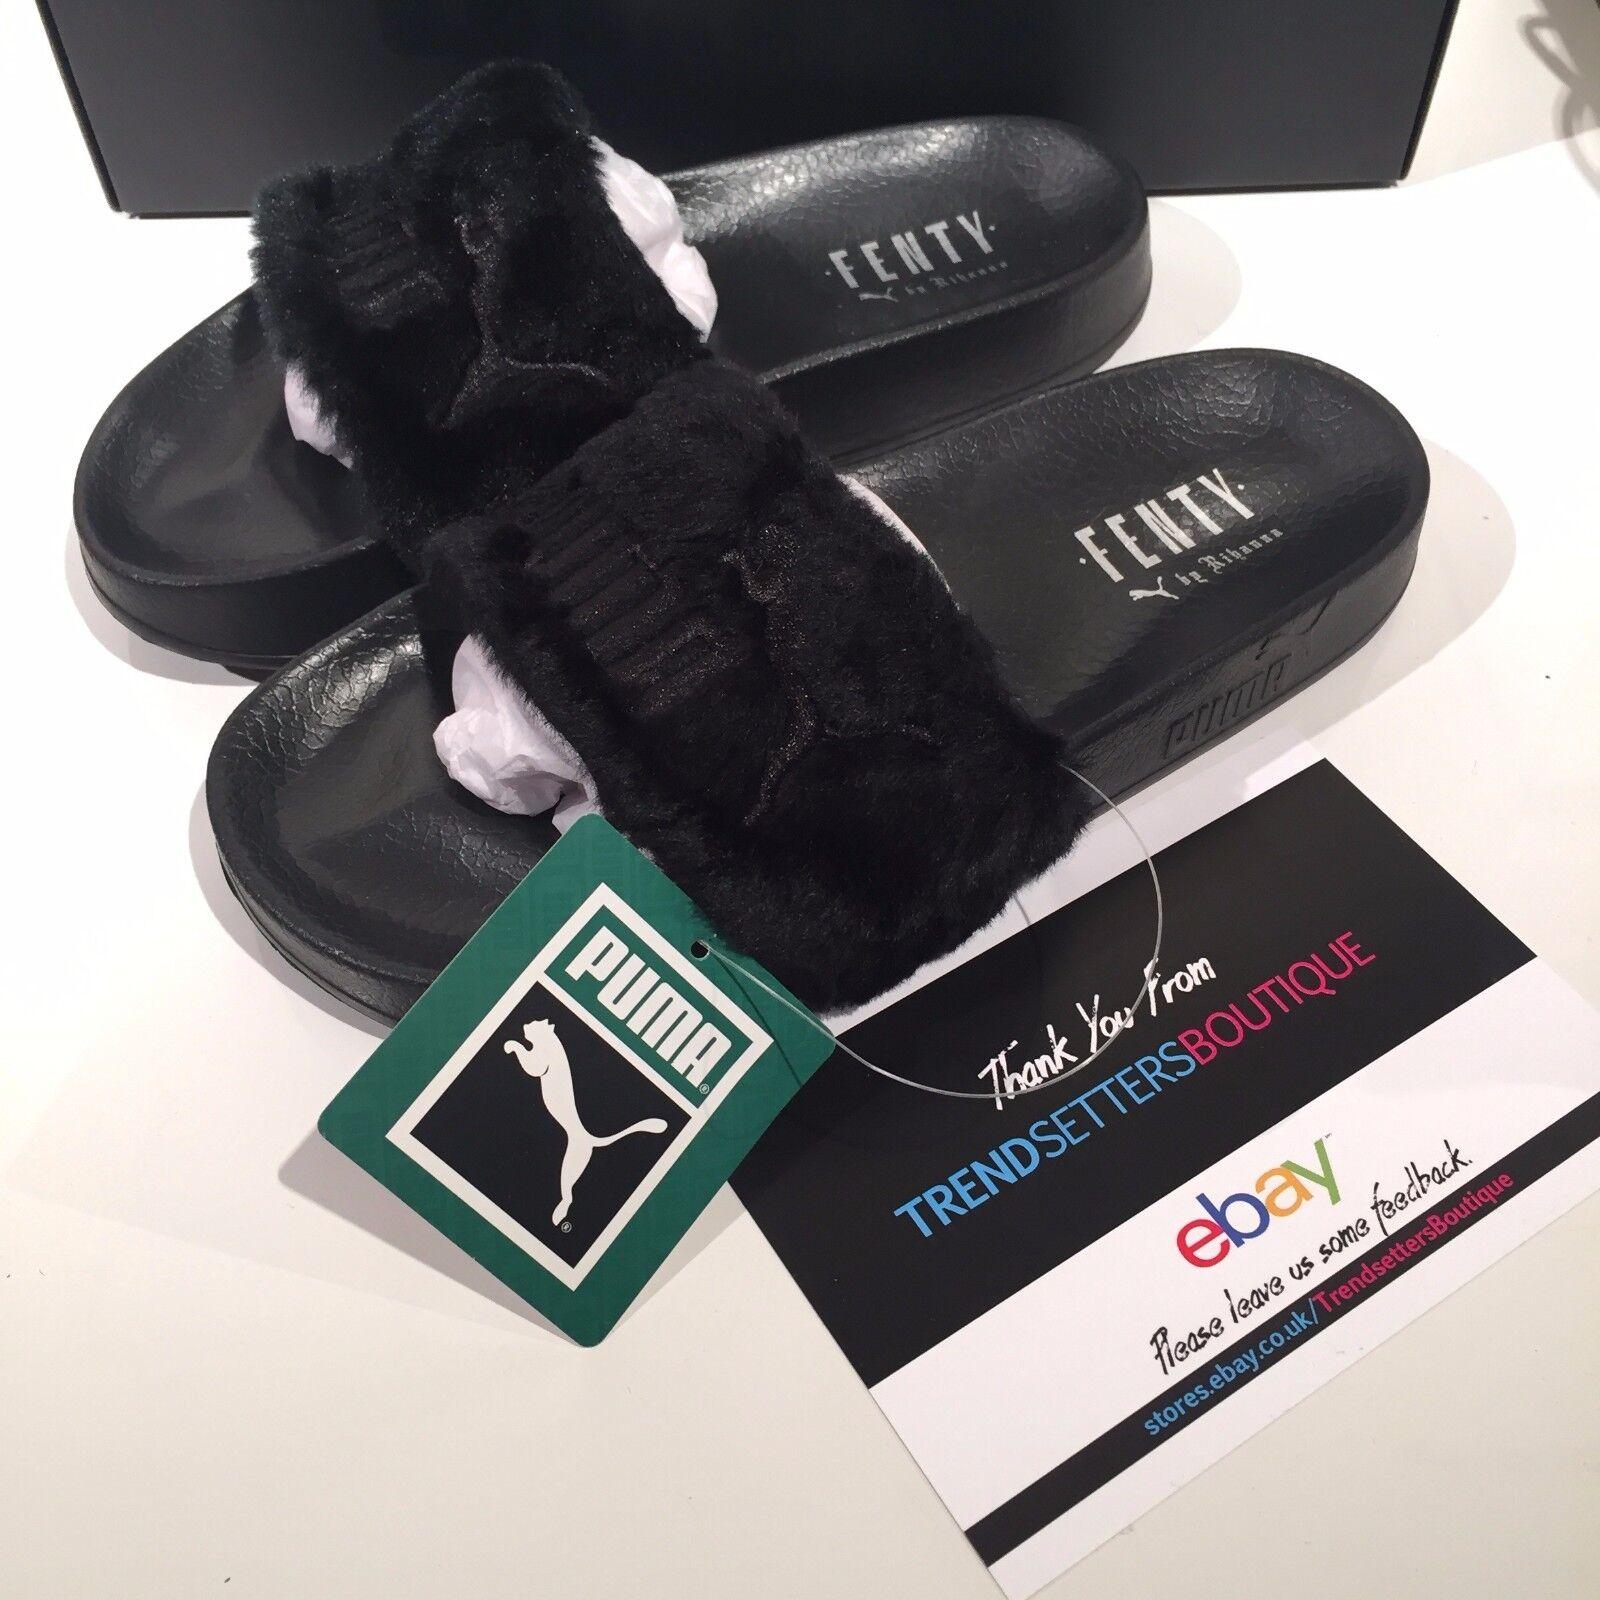 Puma Rihanna Negro Furr Fur Fur Fur leadcat DIAPOSITIVAS PANTUFLAS UK US 4 5 6 7 8 9 10 Hand  tienda